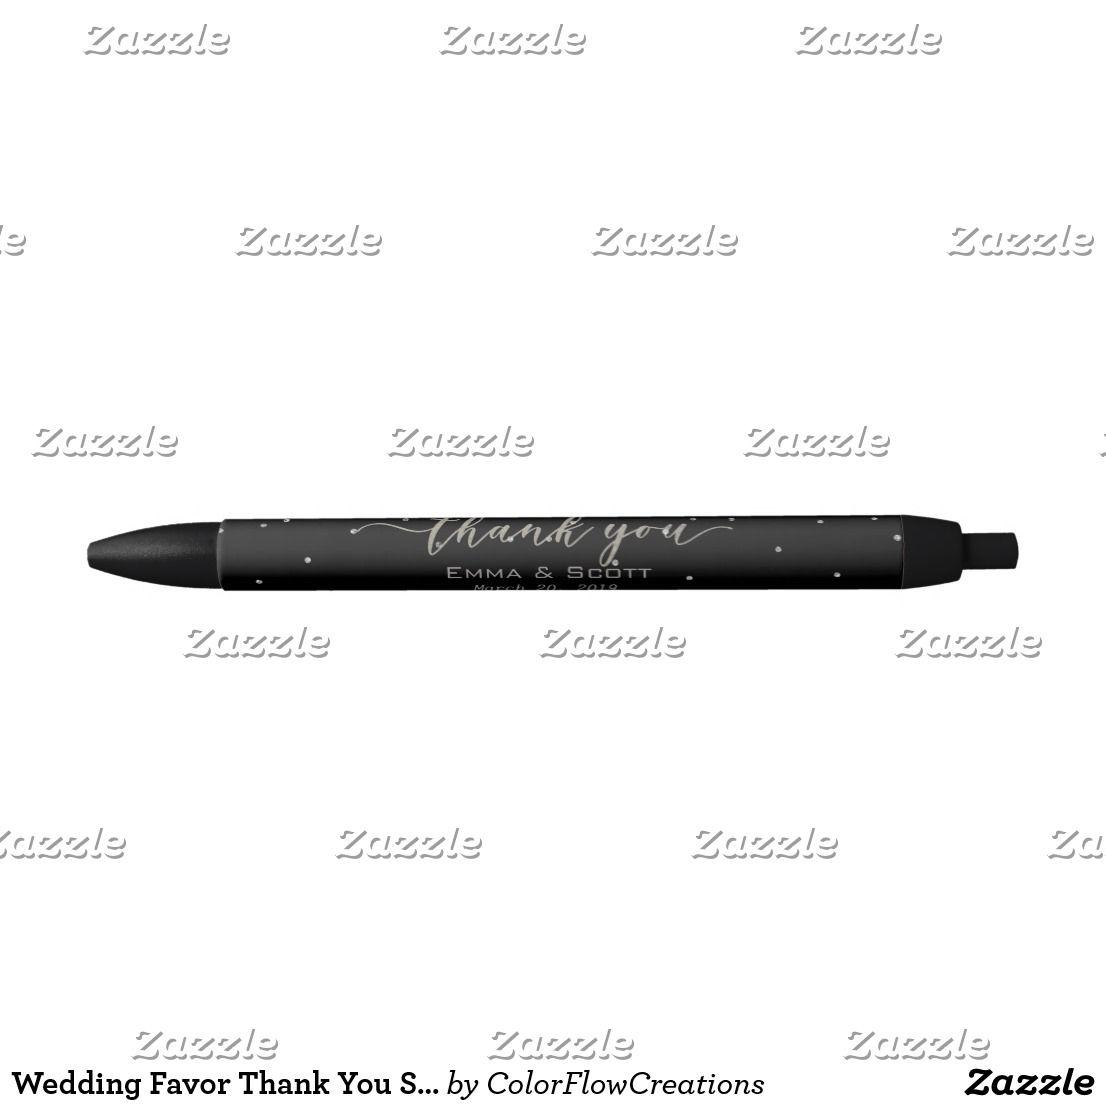 Wedding Favor Thank You Silver Script Confetti Black Ink Pen Zazzle Com Wedding Favours Thank You Wedding Favors Silver Wedding Theme